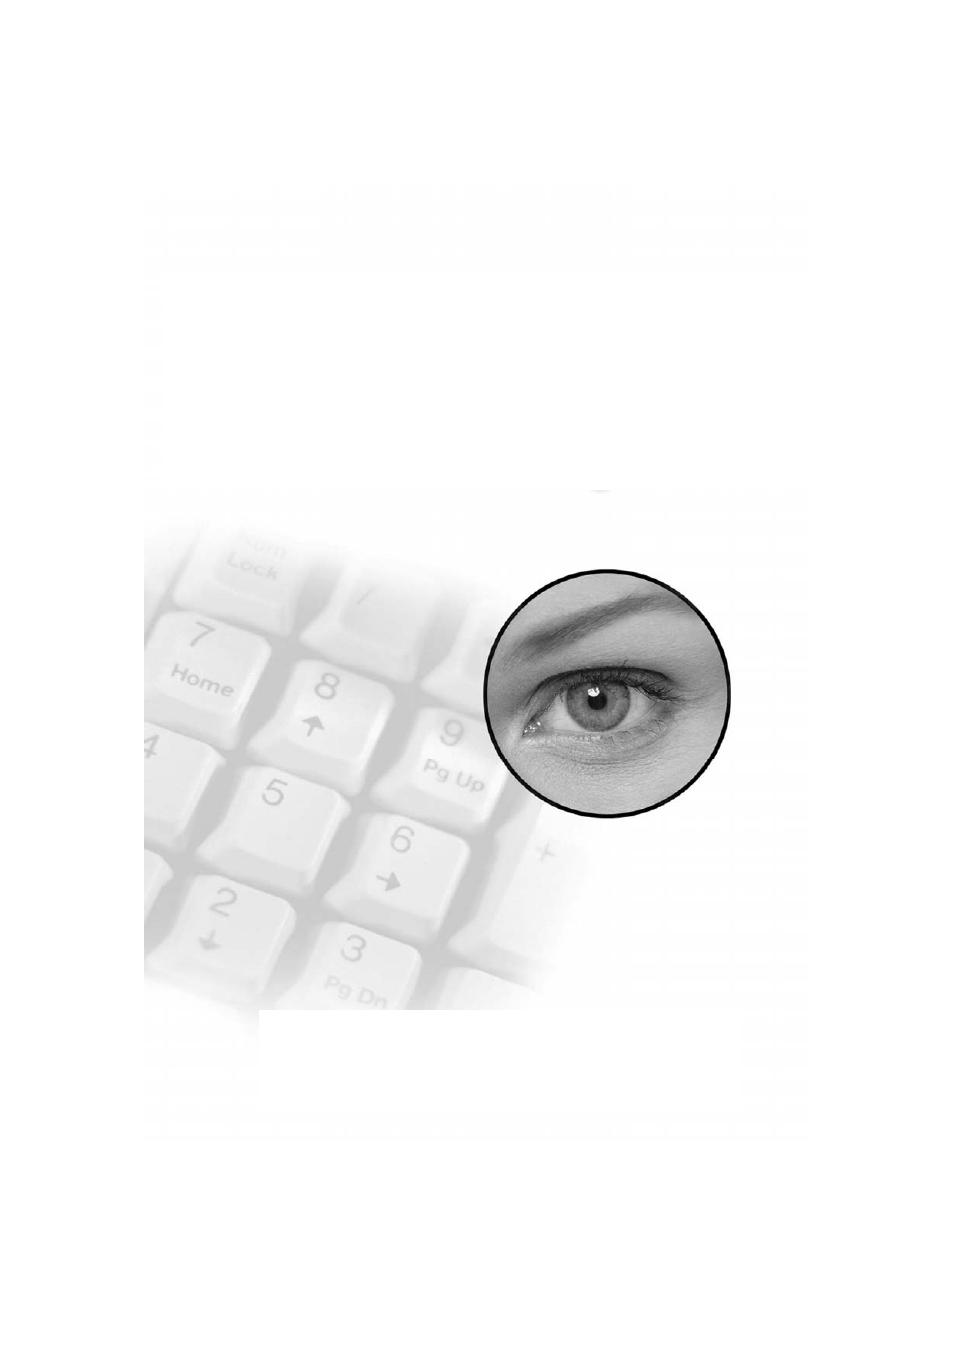 CCTV Camera Pros Geovision 8 2 Multicam Digital Surveillance